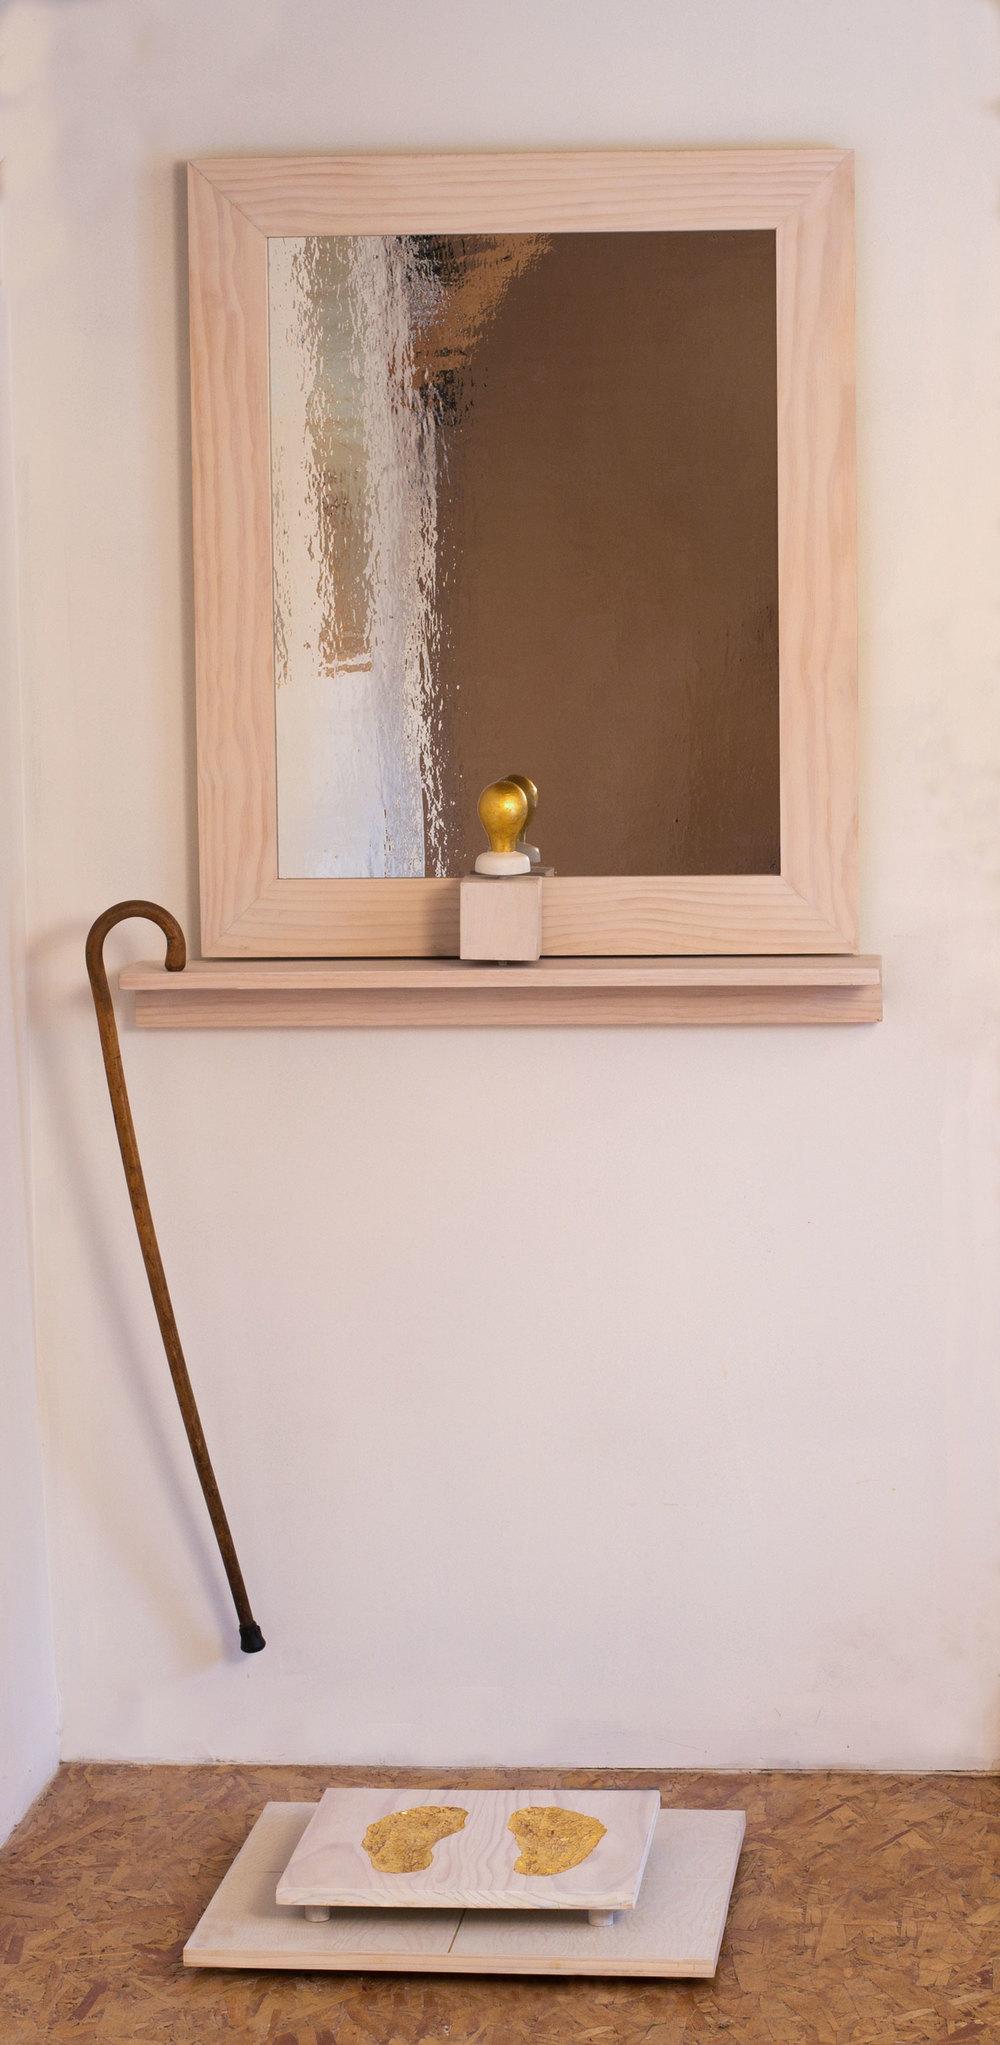 """Possible Self-Portrait"", 74"" h x 36"" w x 32"" d, wood, mylar, gold leaf, paint, found object; ©Tom Gormally 2015"